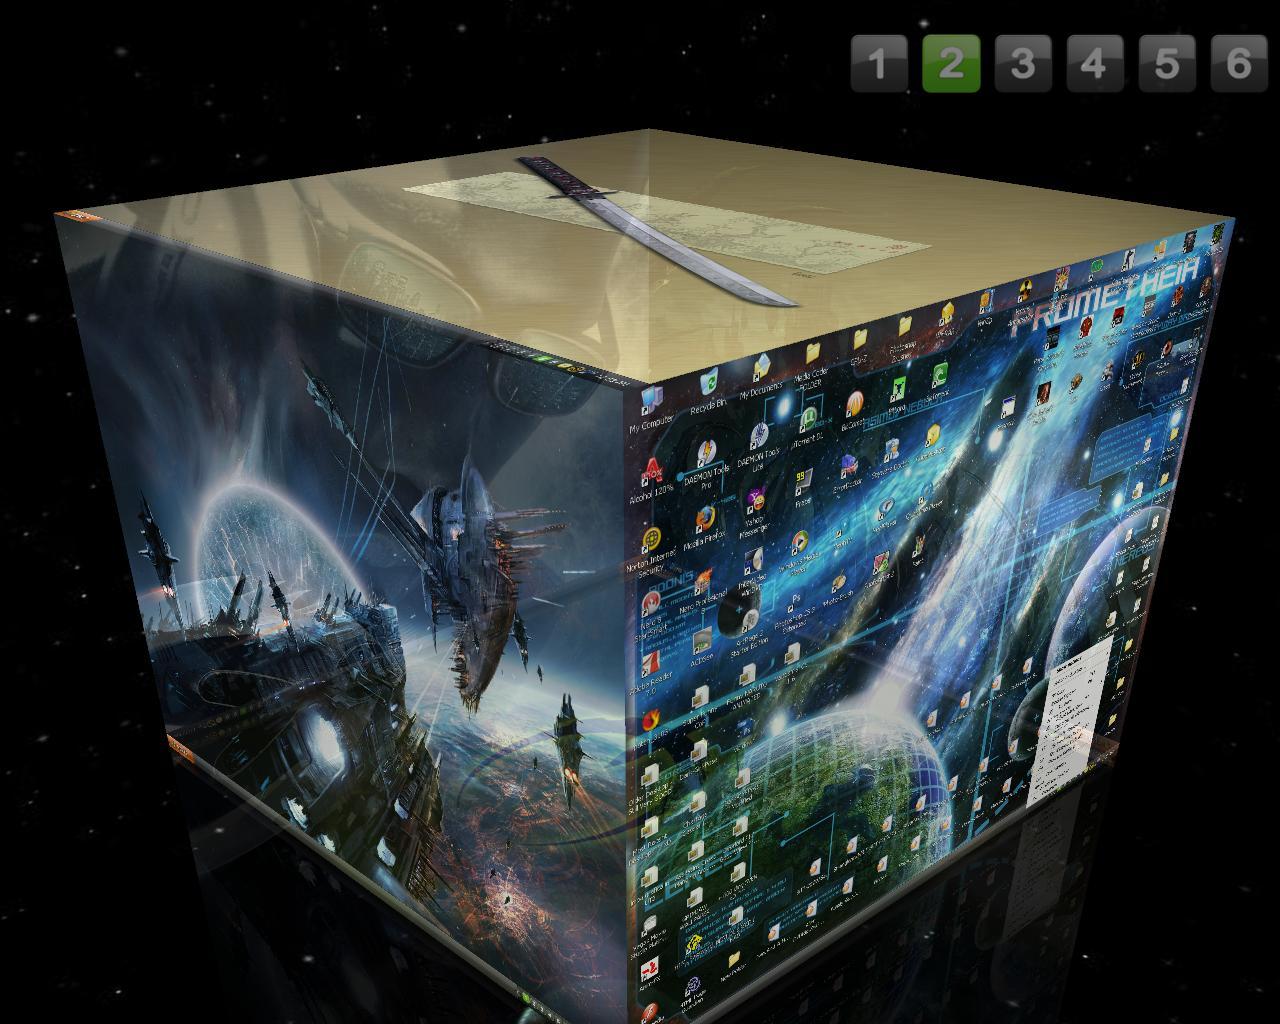 cube computer wallpapers desktop - photo #42